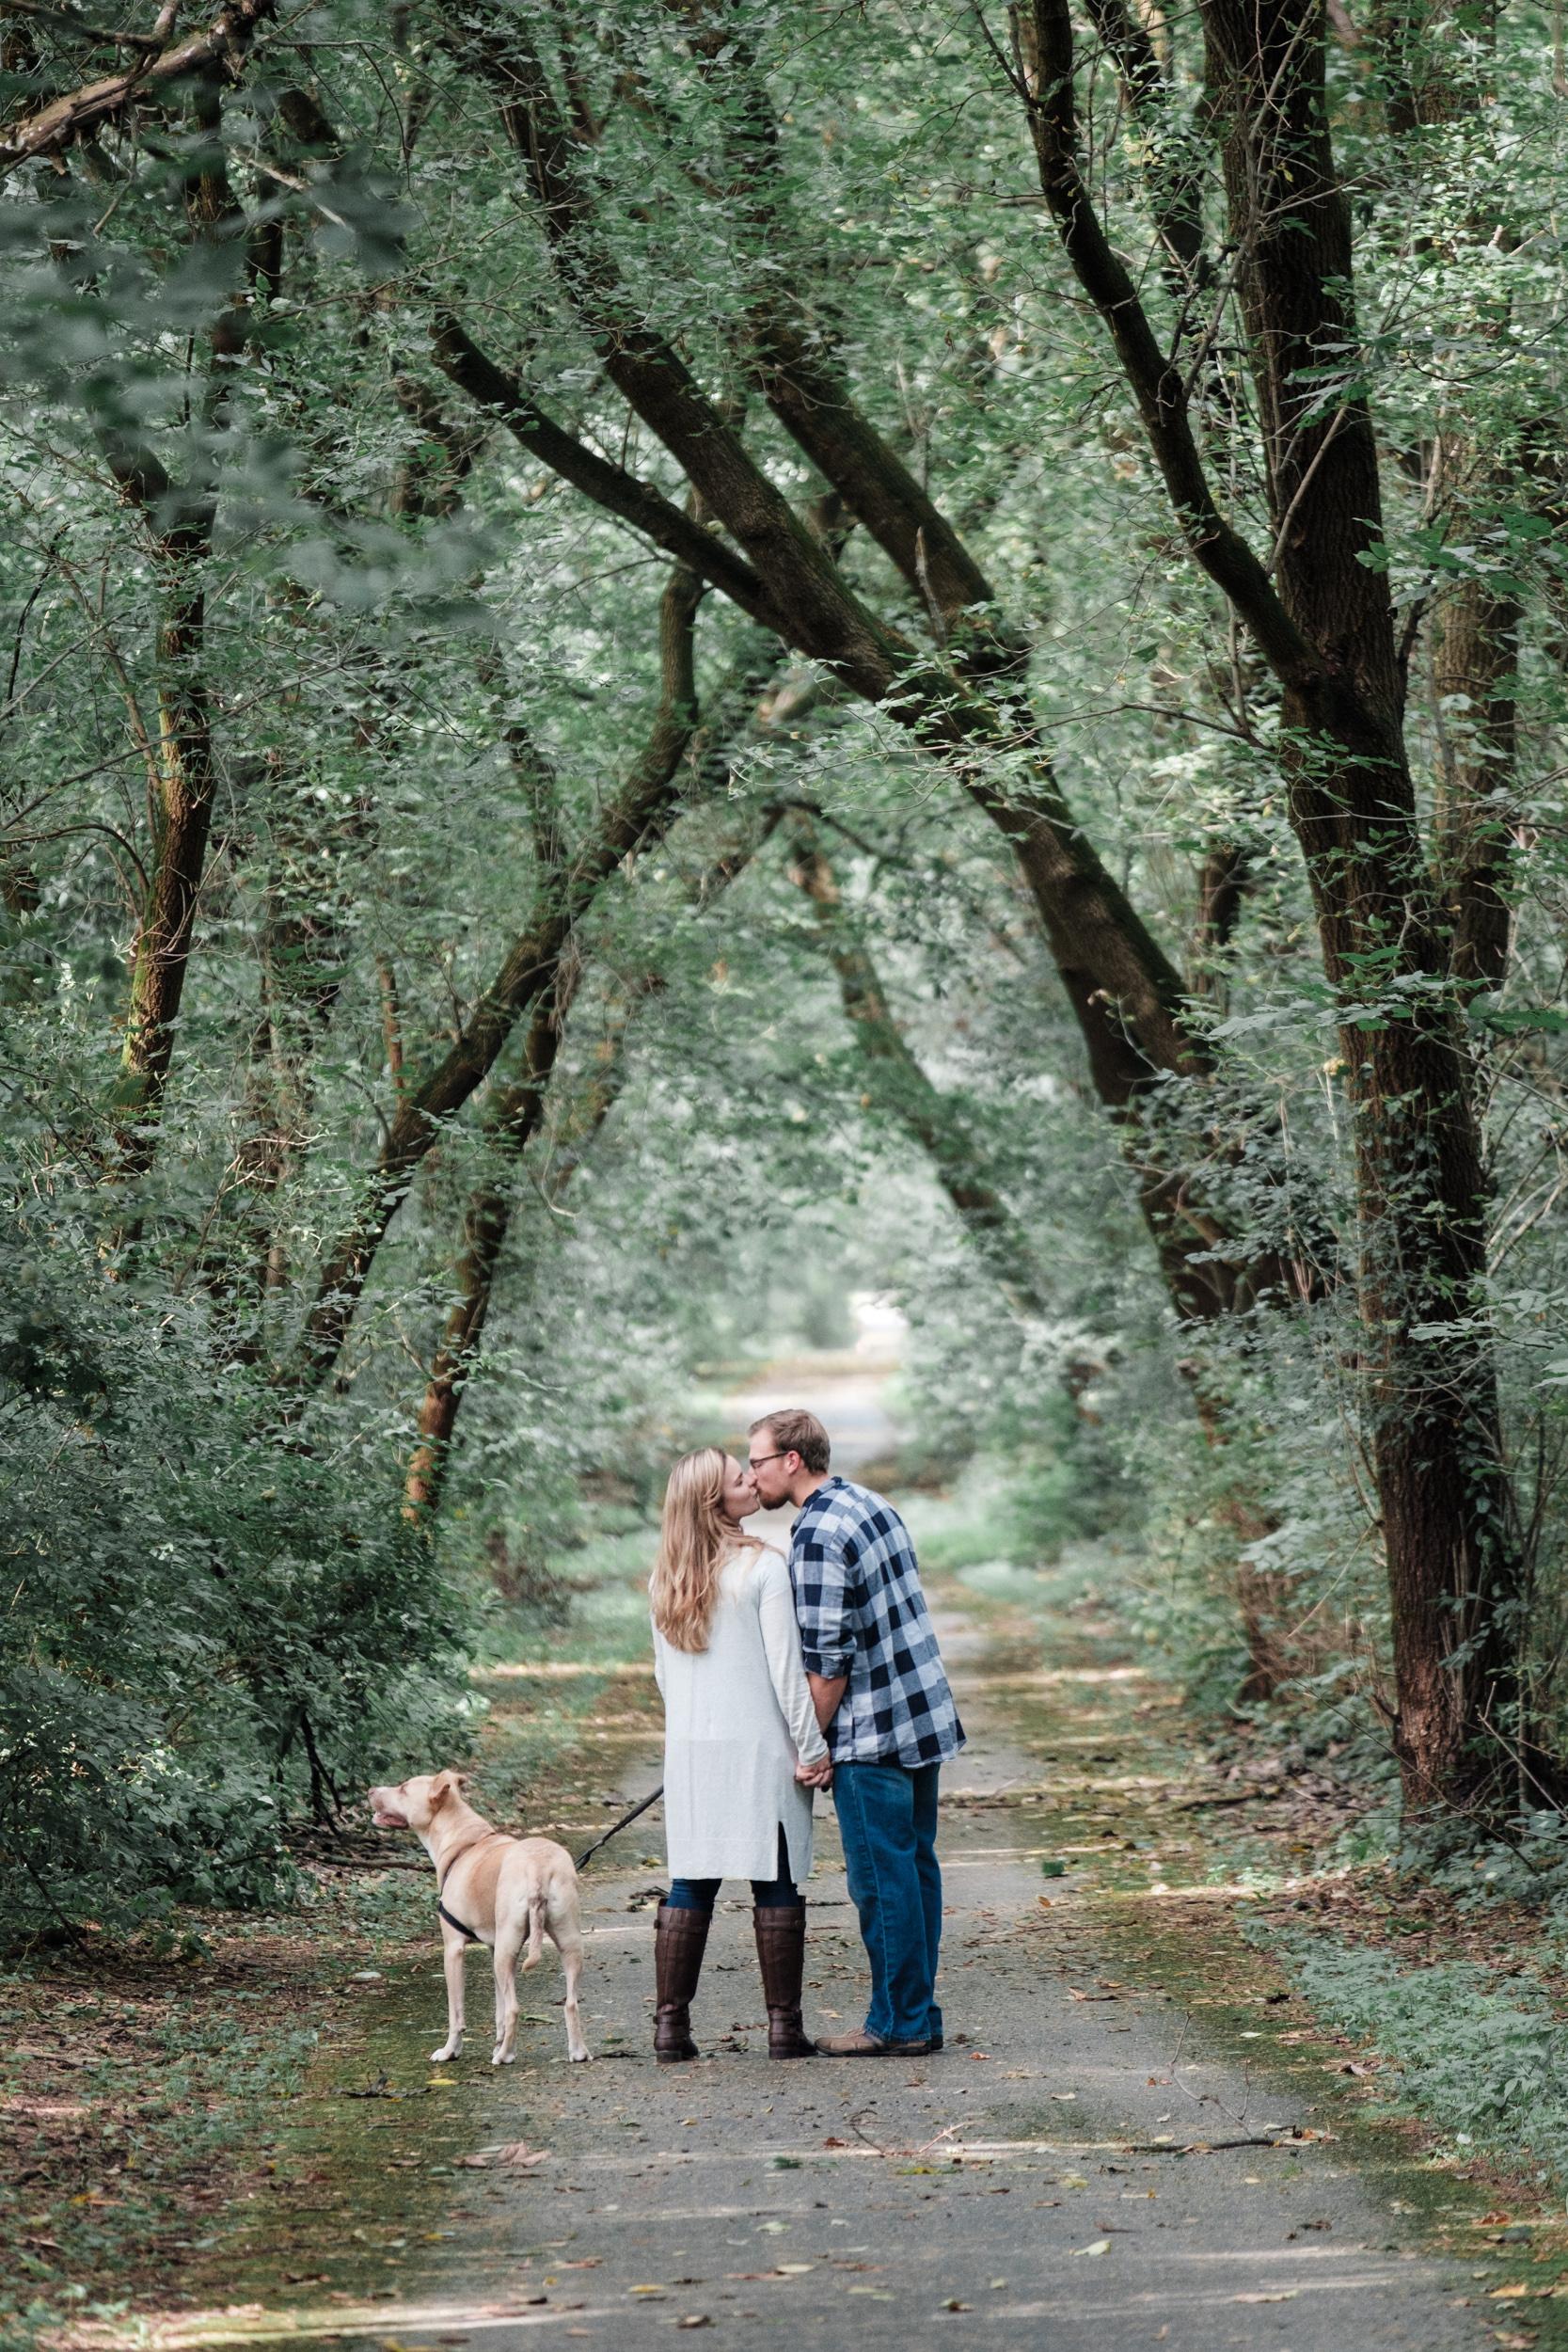 Wisconsin couple, The Fields Reserve Wedding, The Fields Reserve Photographer, Byron Photographer, Rockford Photographer, Best Photographer, Rock Cut State Park, Park Engagement, Destination Engagement, Colorado Engagement, Mountain Engagement, Doggy Engagement